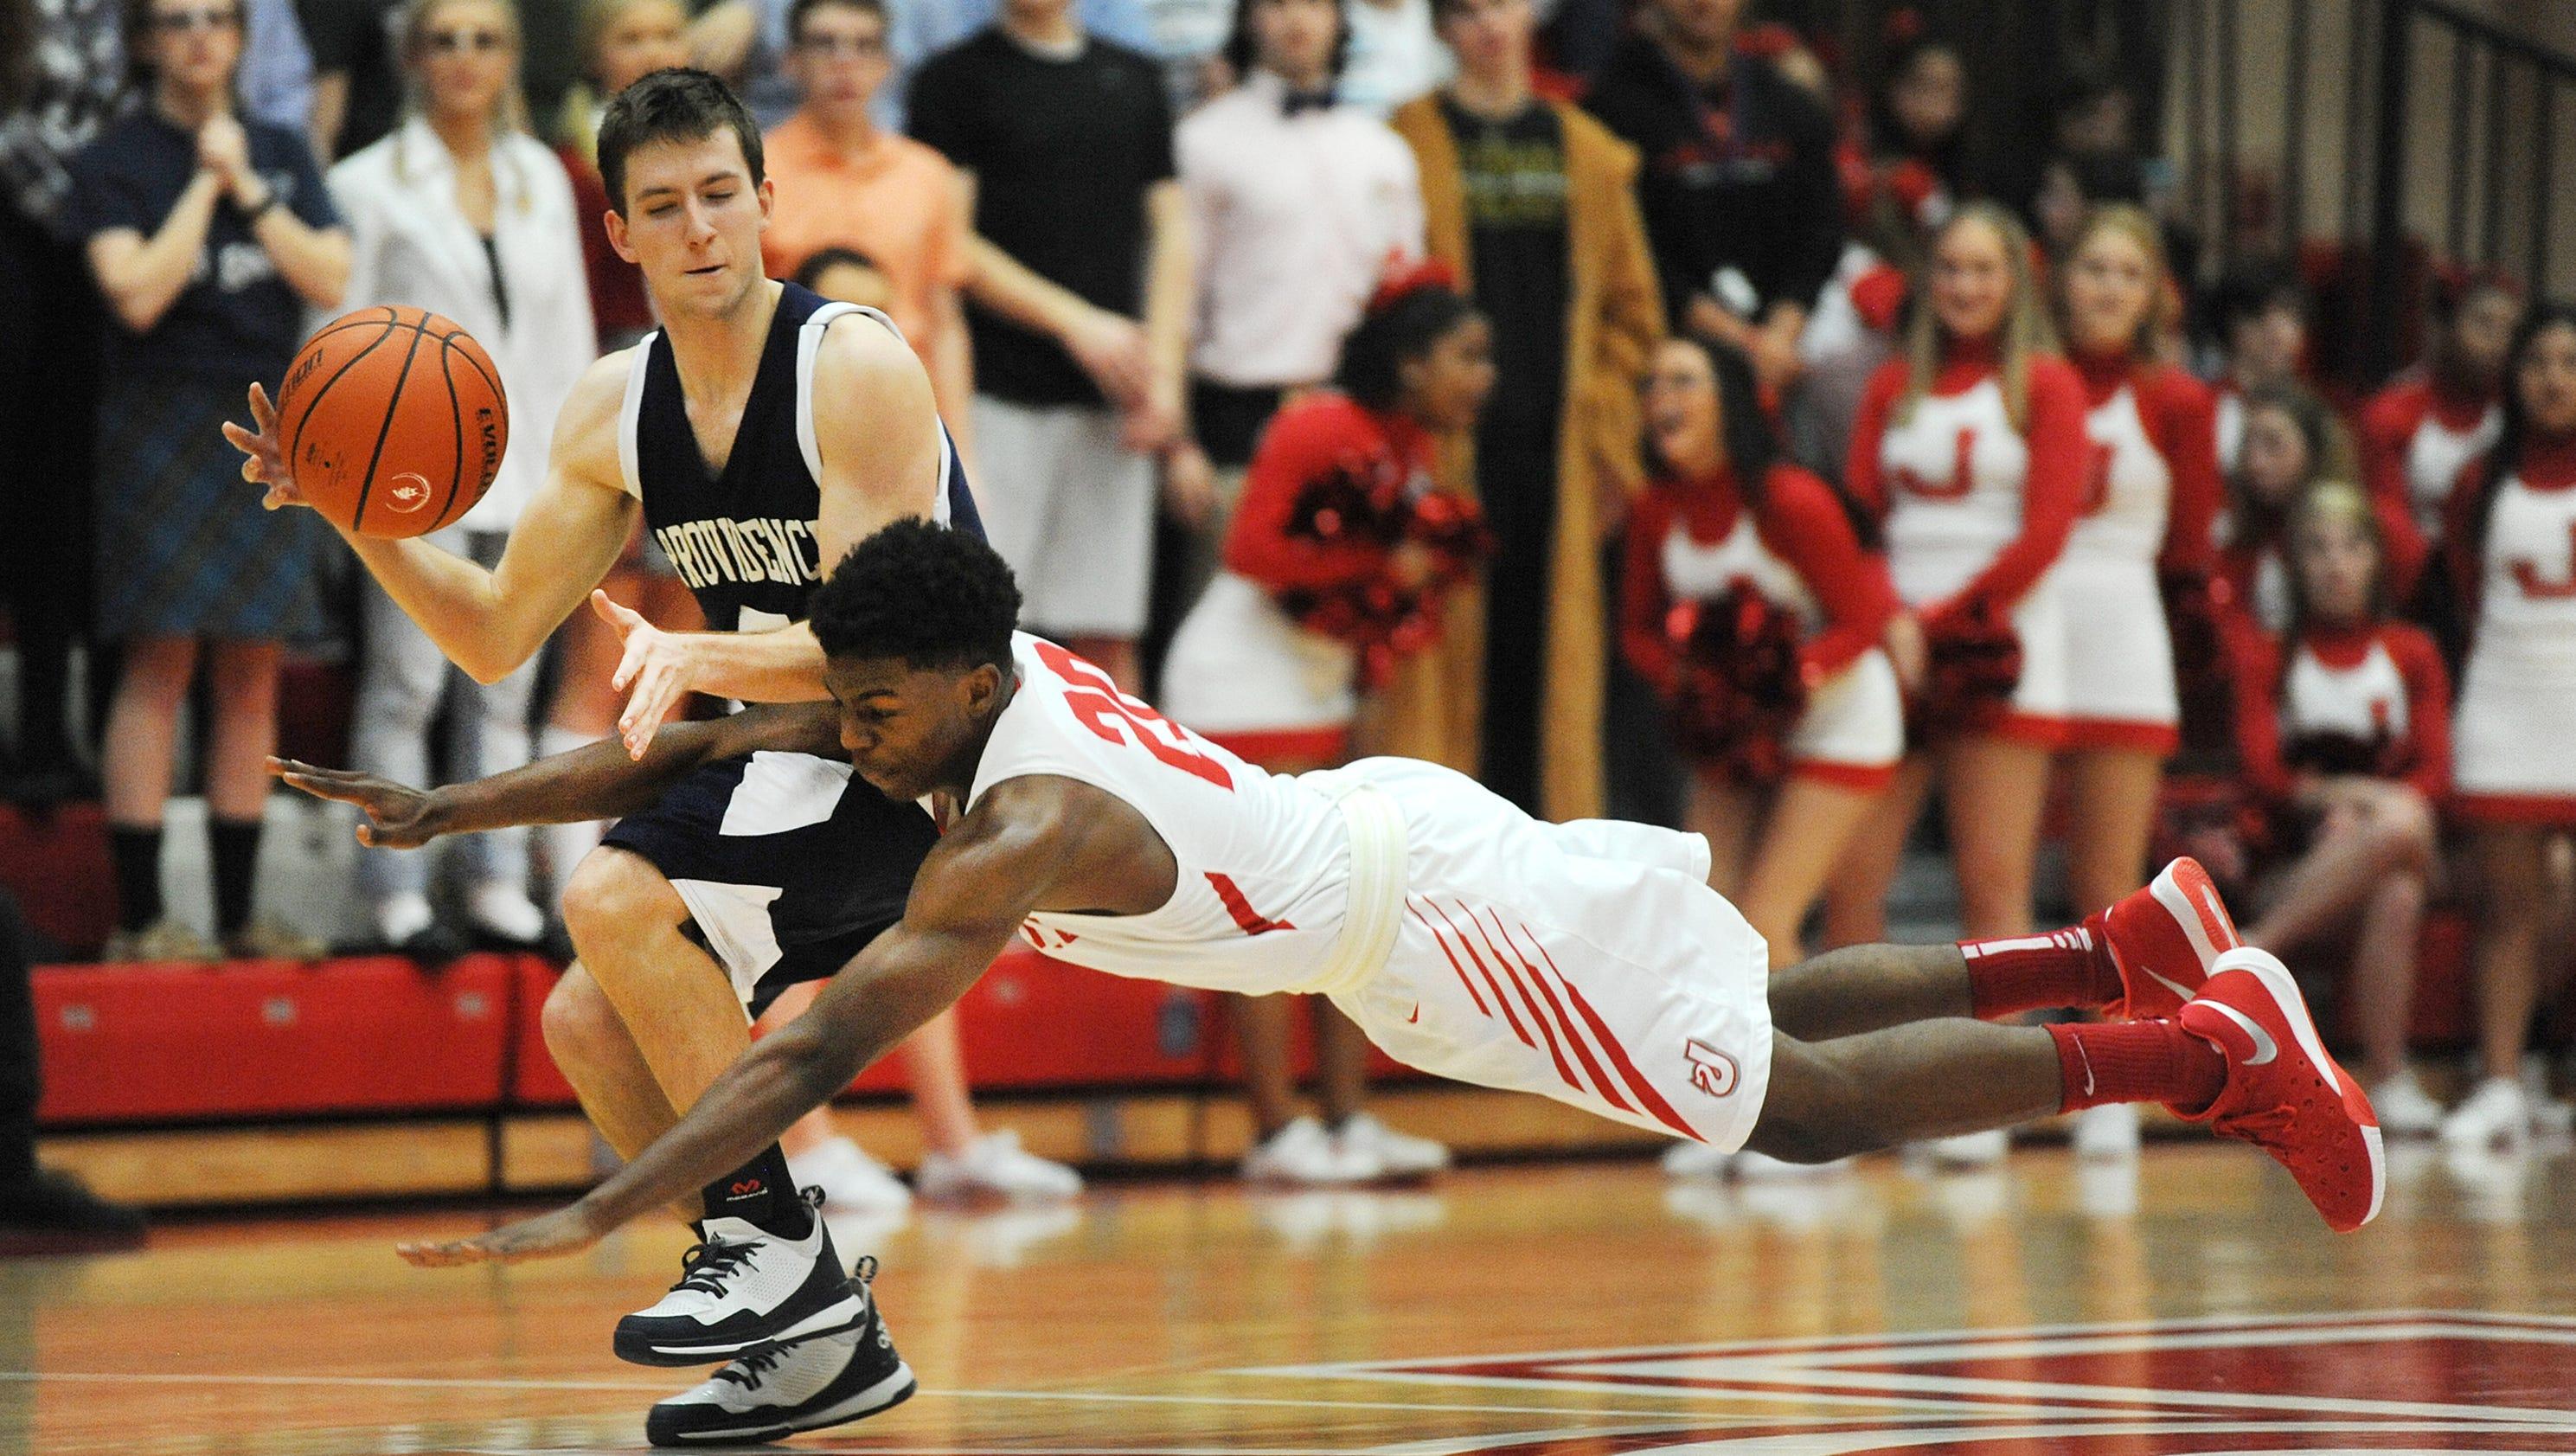 Gallery | Providence vs. Jeffersonville, boys basketball